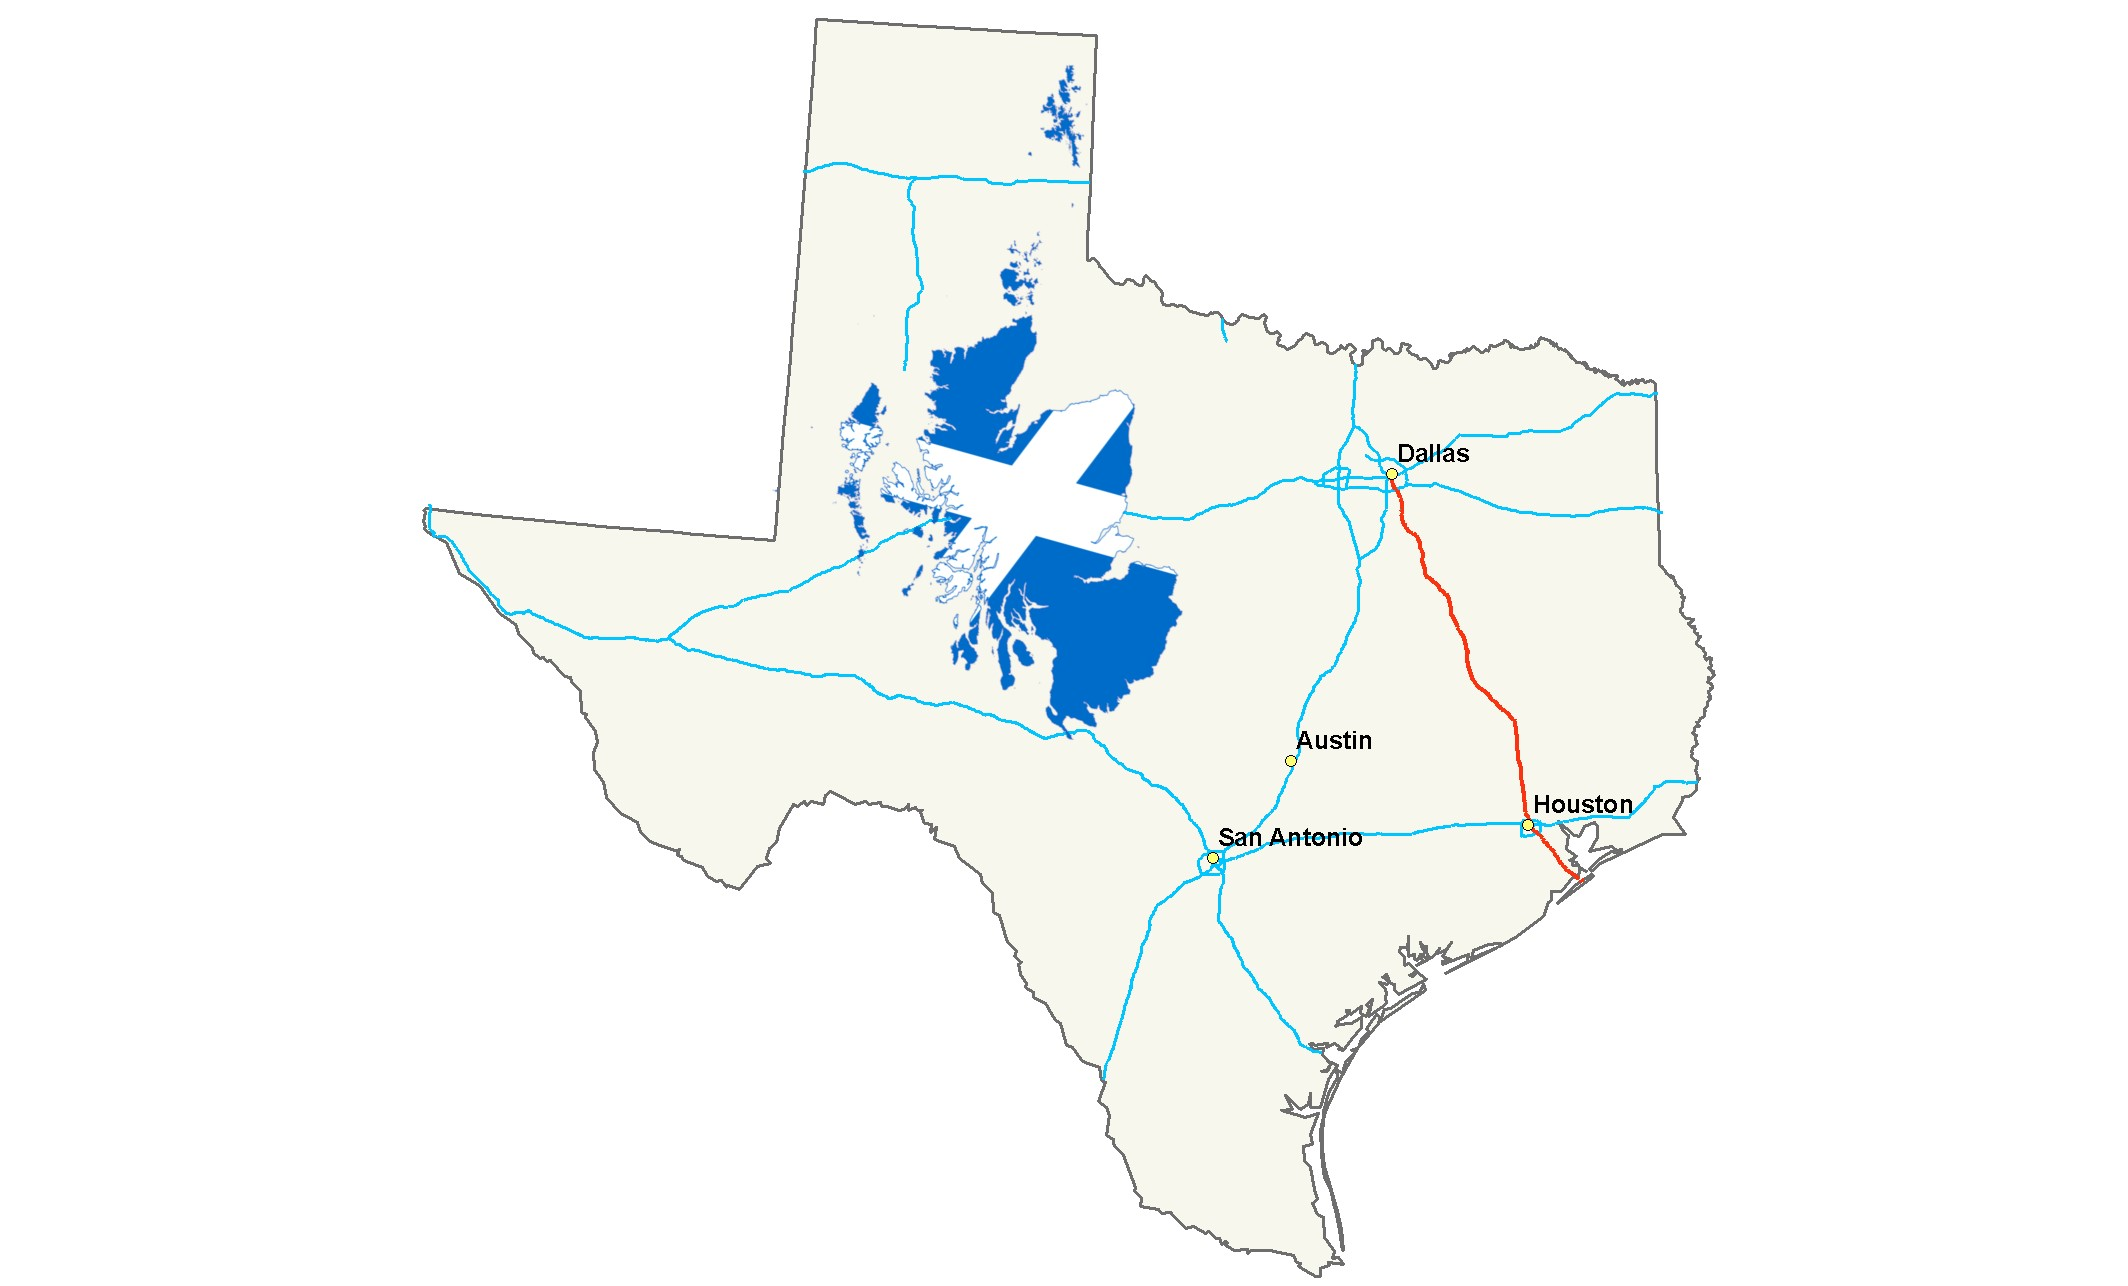 Texas Compared to Scotland